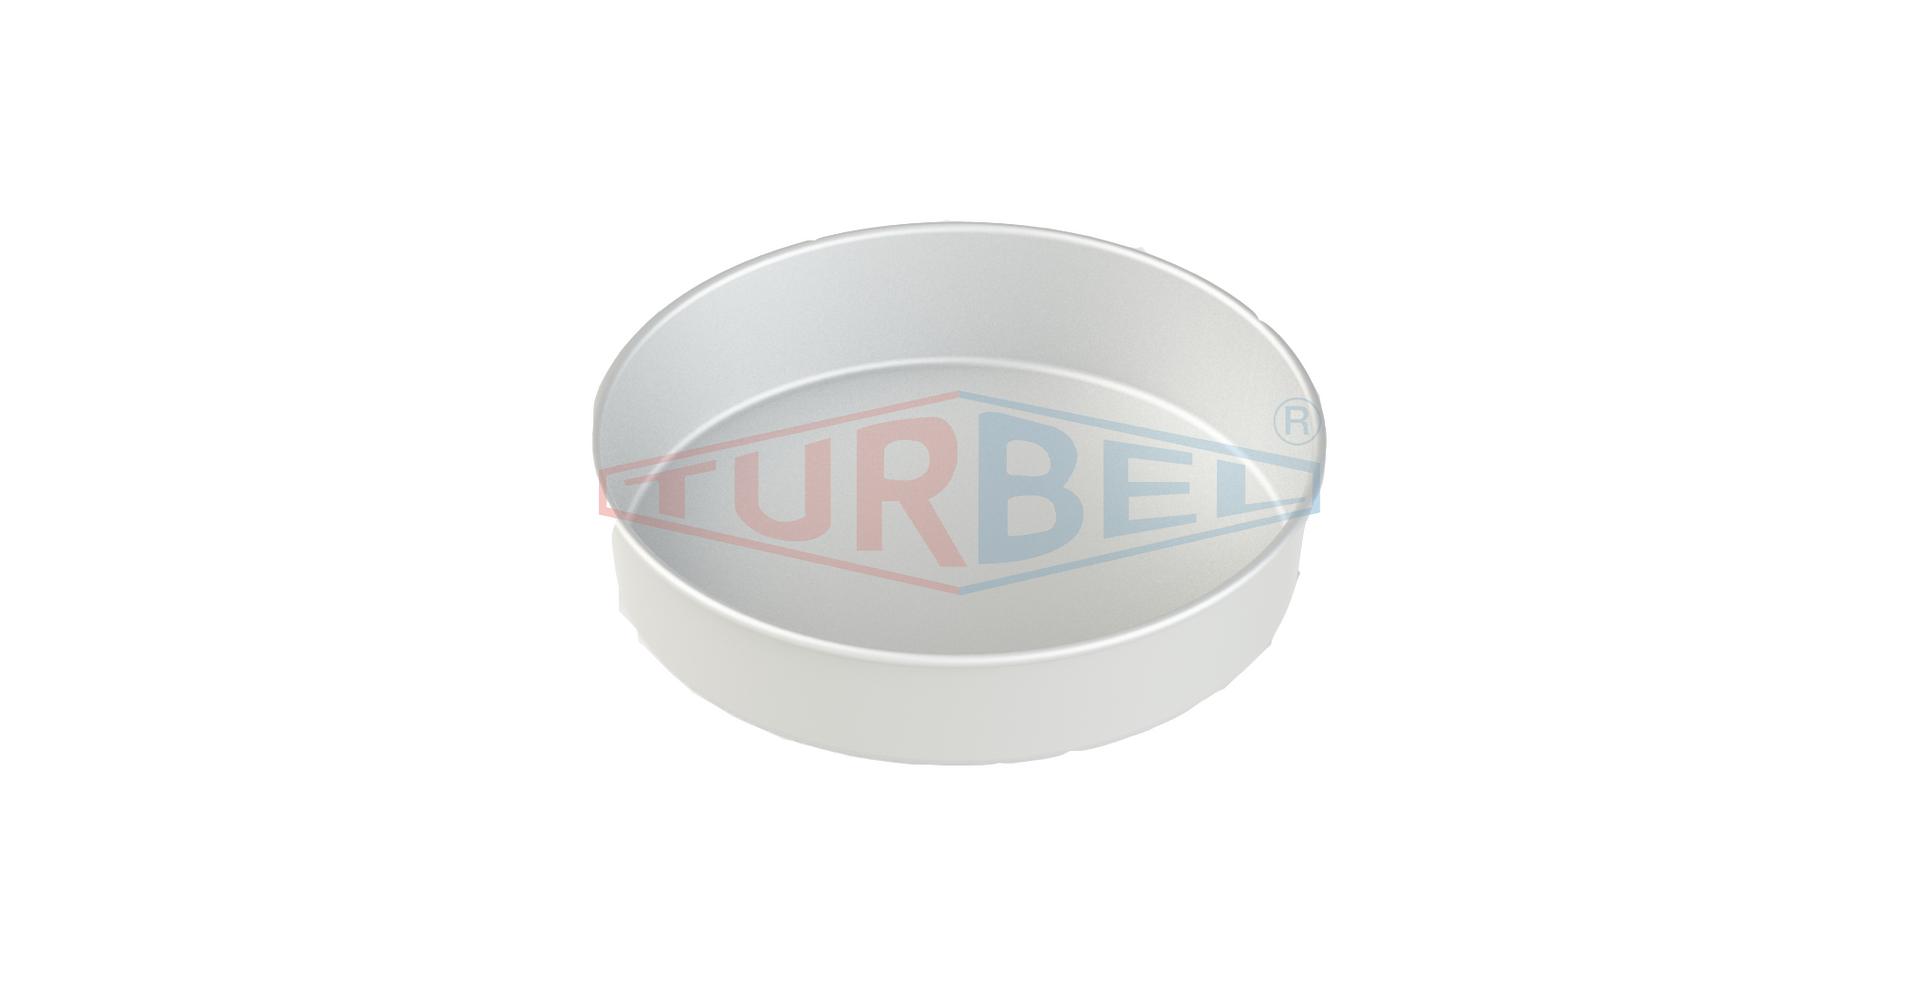 Turbel Tava Pizza & Breadstick / Baguette Pans